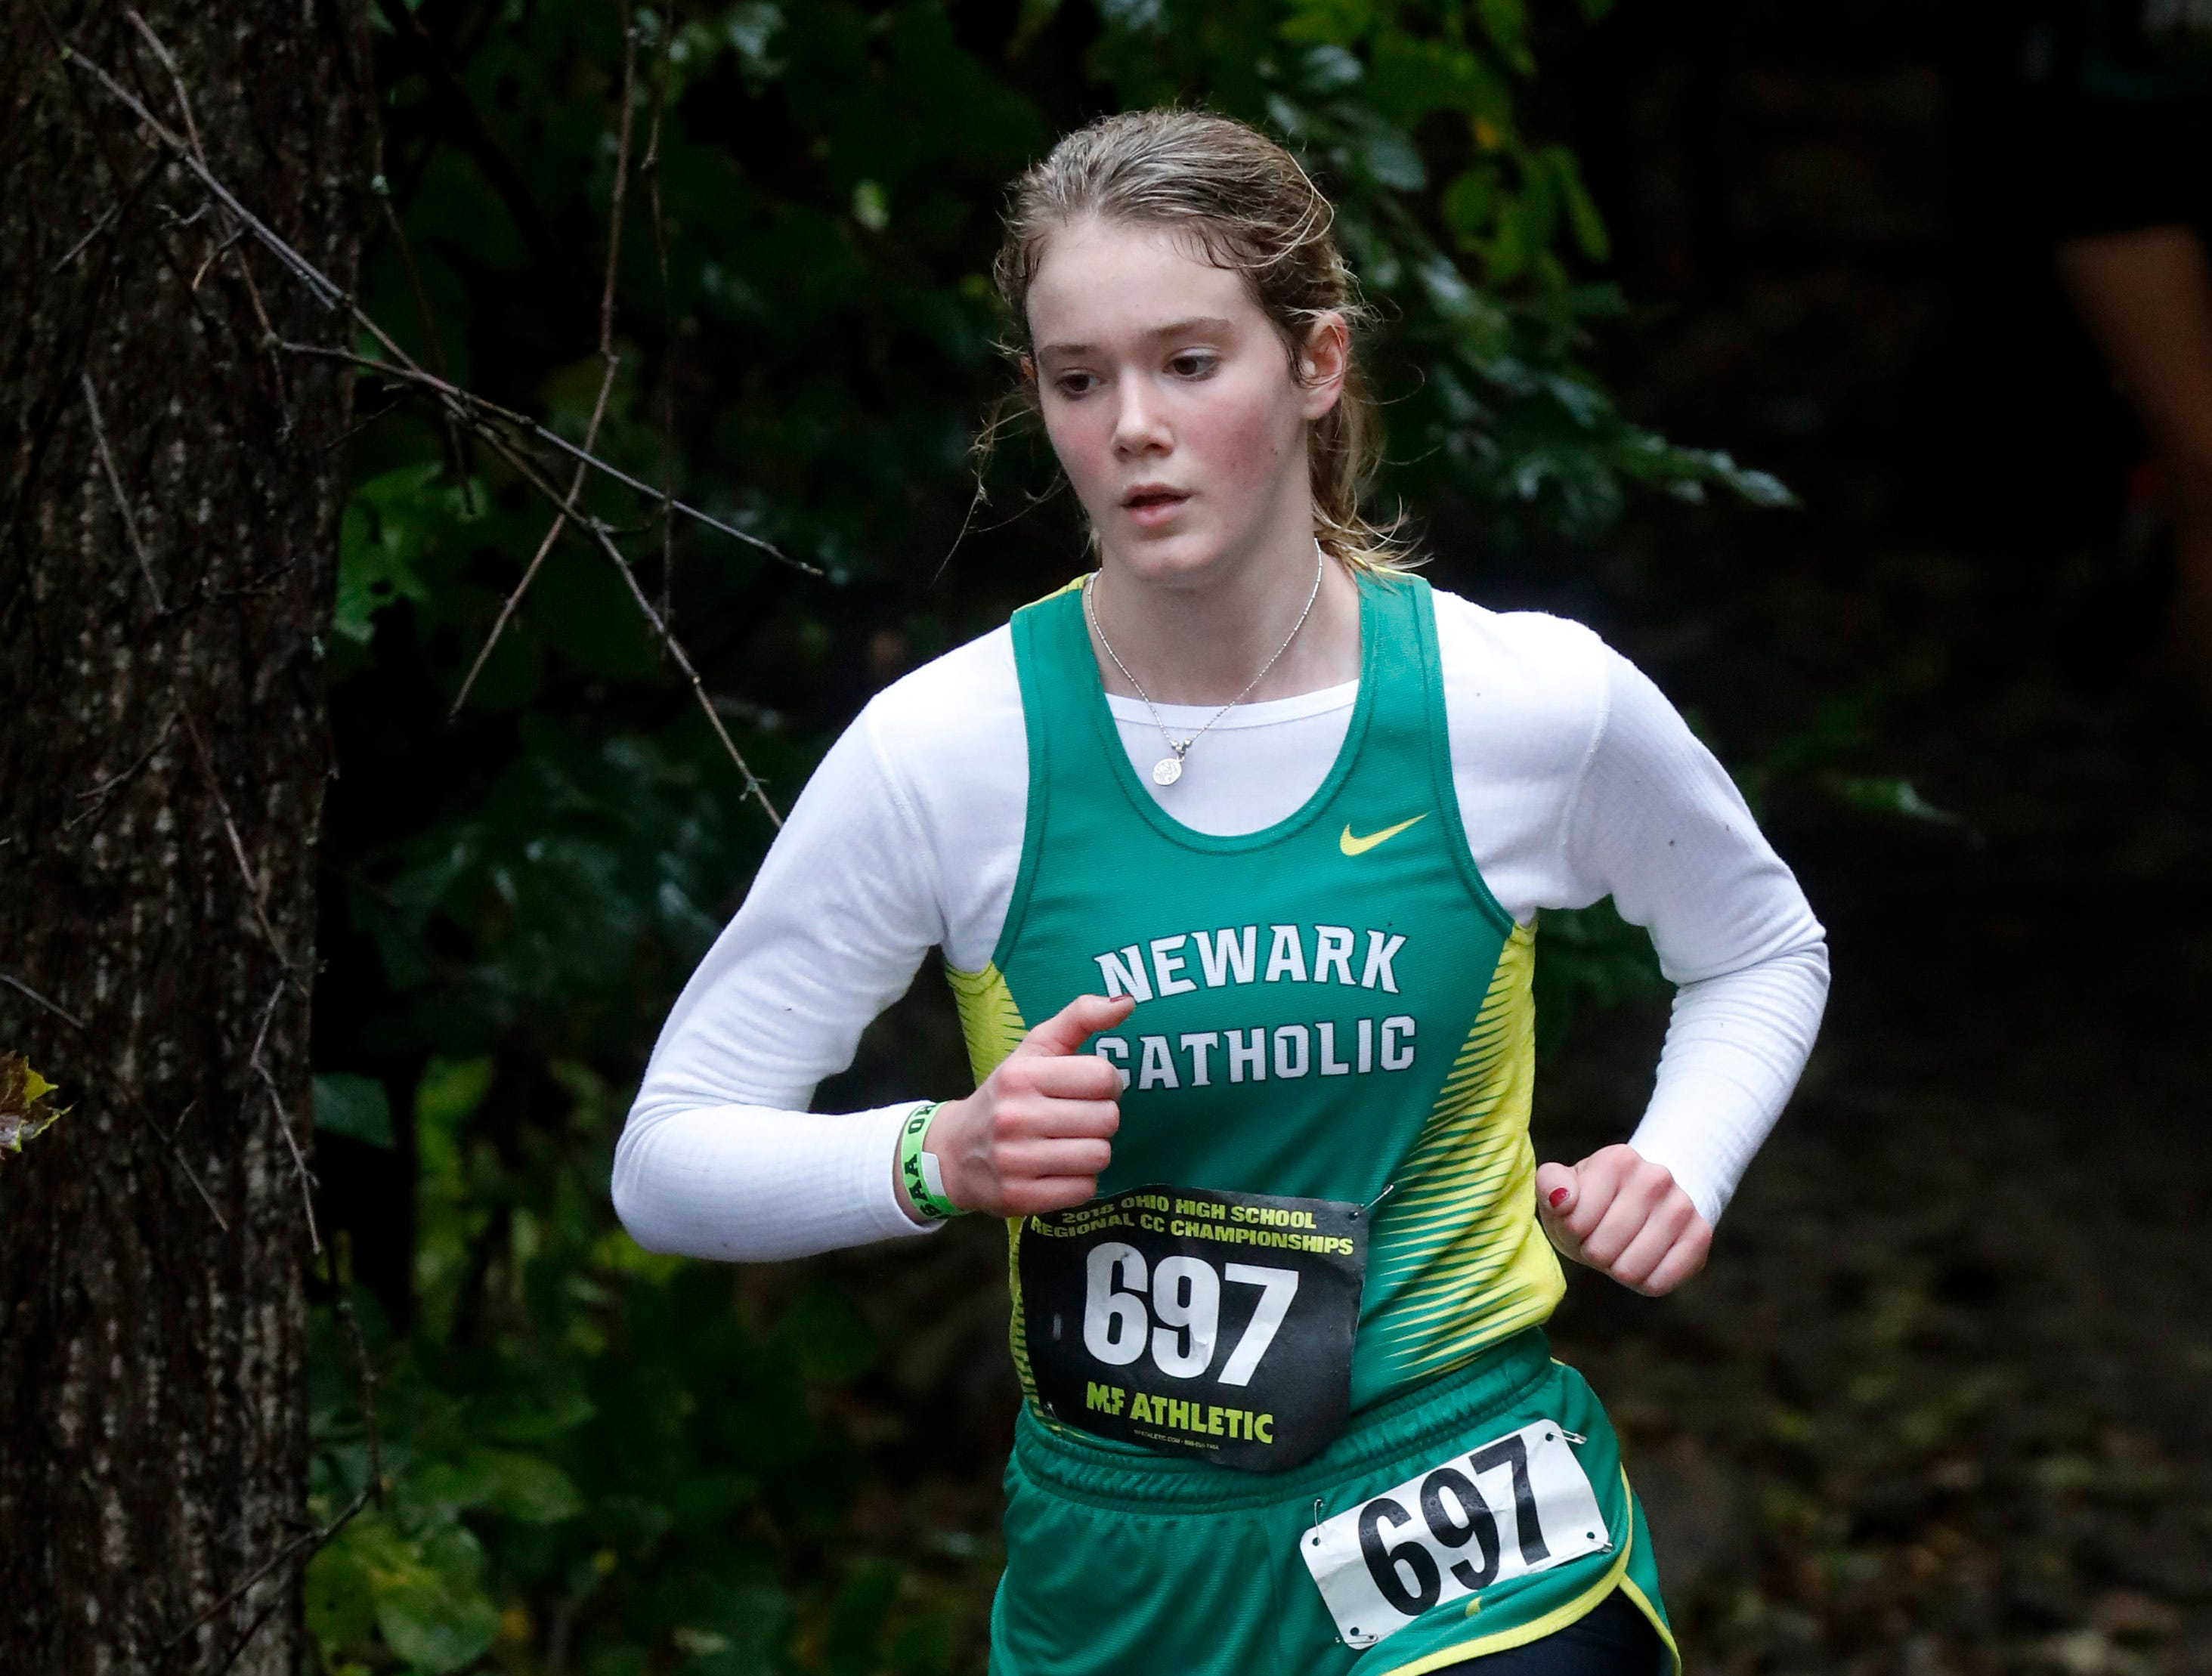 Newark Catholic's Chloe Richardson runs in the Regional Cross Country meet Saturday, Oct. 27, 2018, at Pickerington North High School in Pickerington.